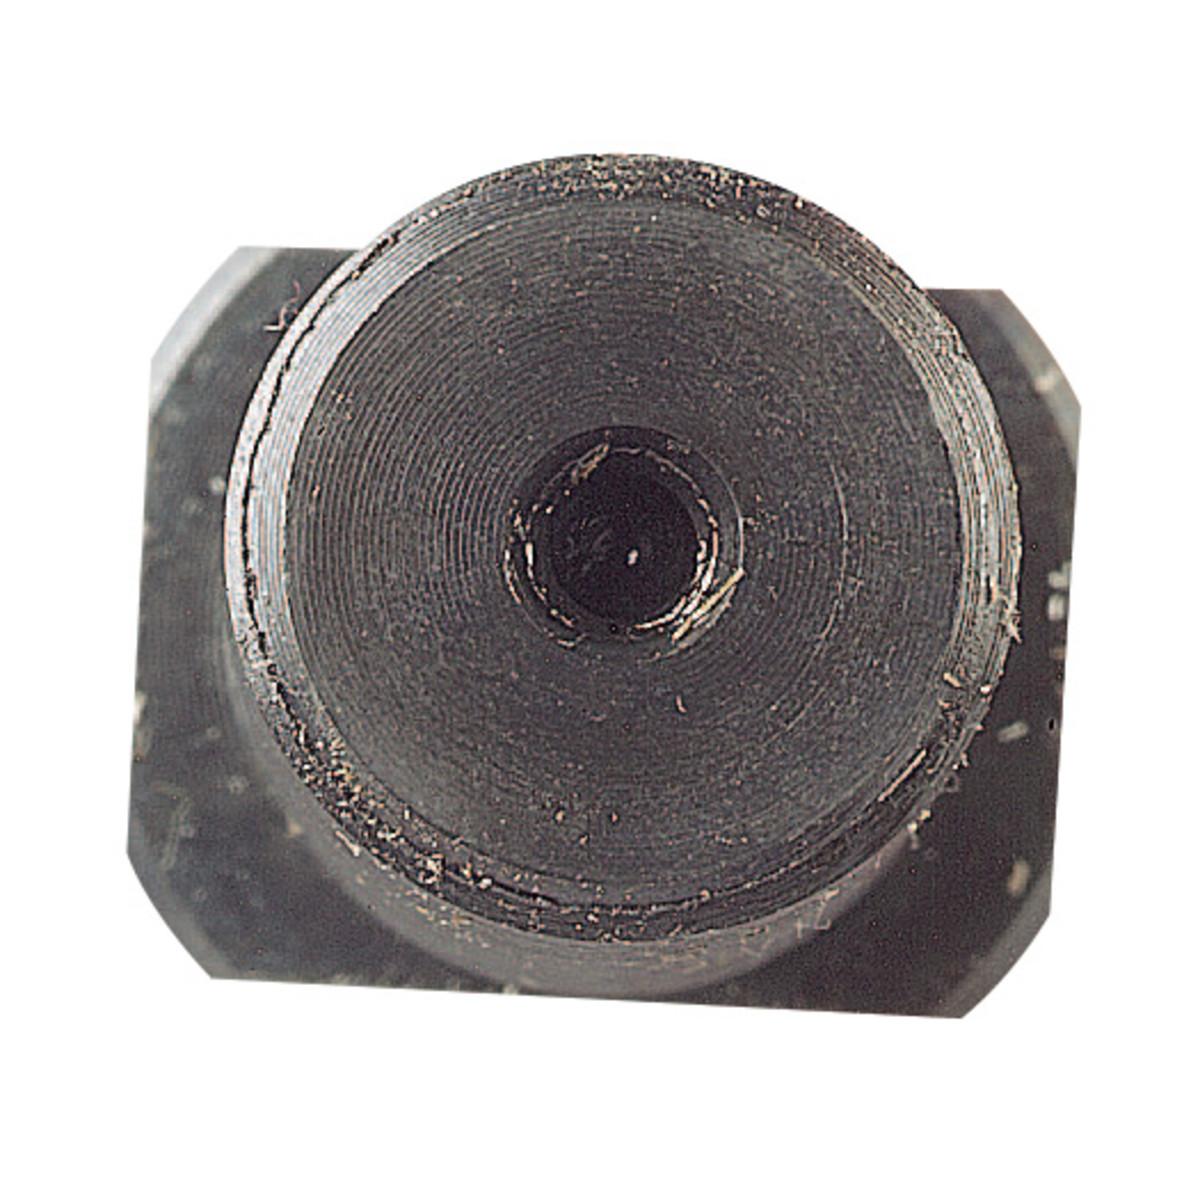 Greenlee 60235 Nut-Counter 3/4-16